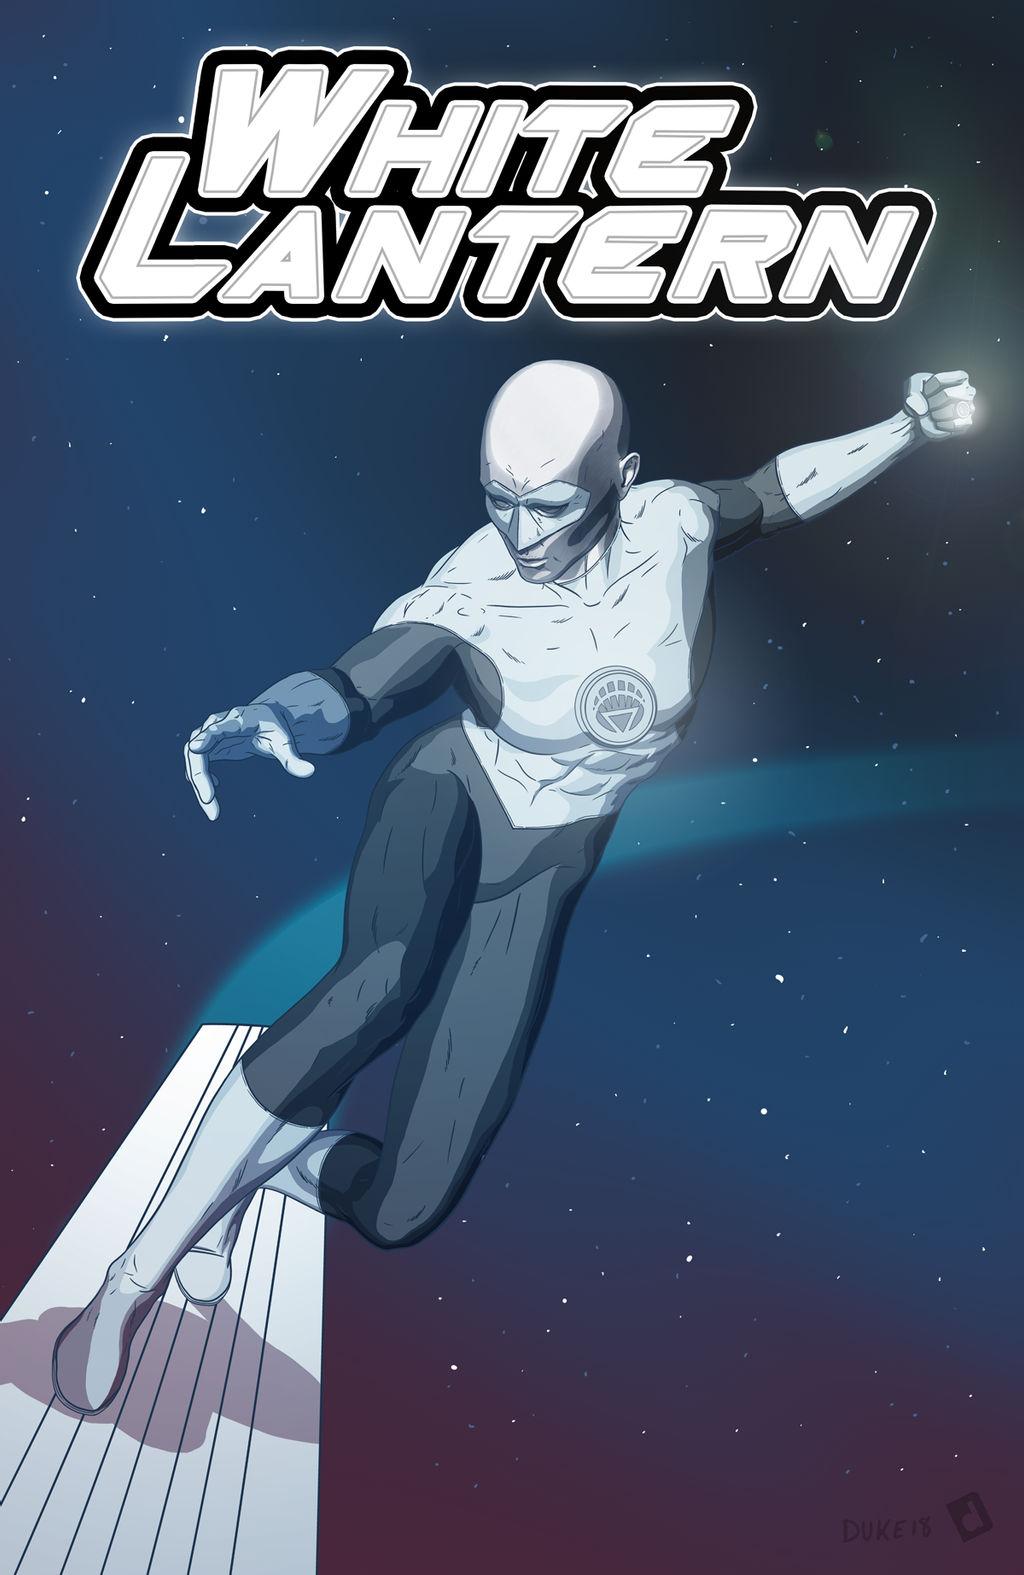 Silver Surfer: White Lantern